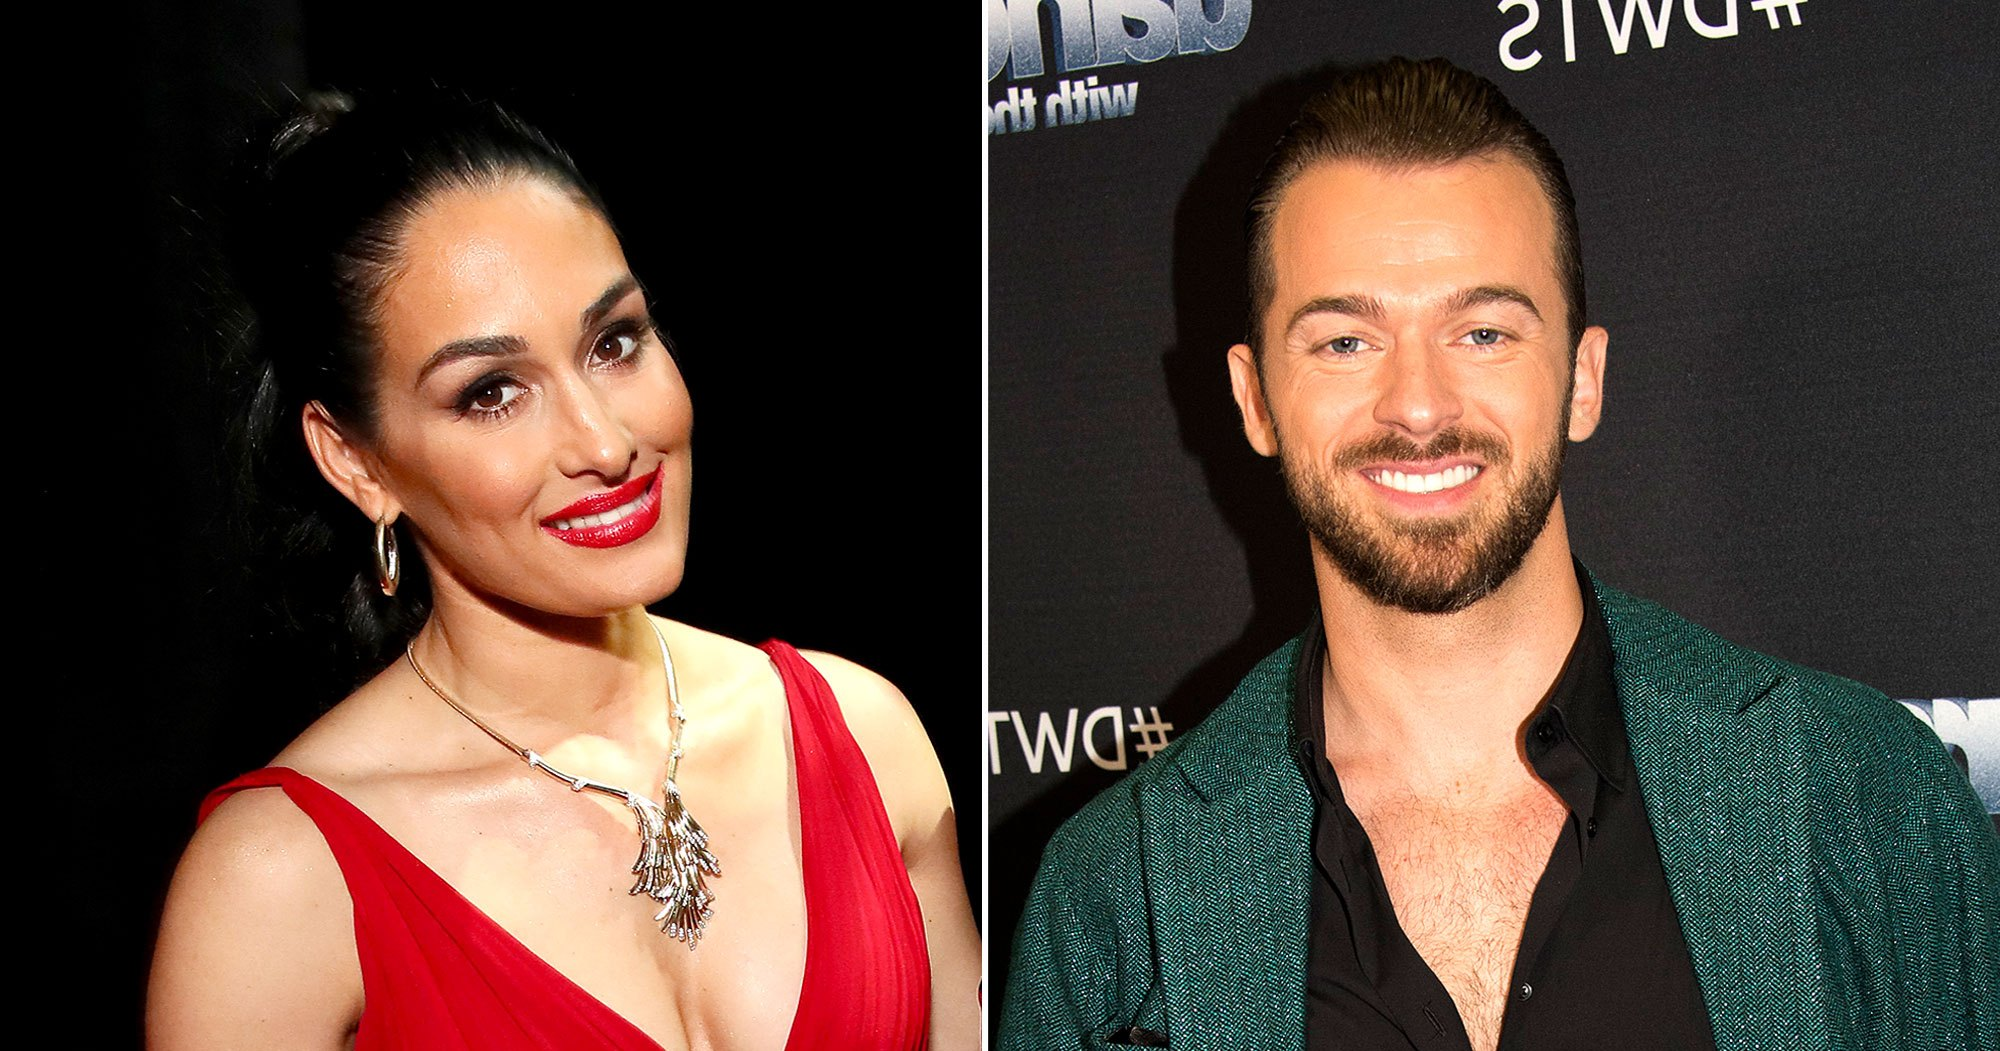 Nikki Bella and Artem Chigvintsev Are 'Just Friends' Despite Having 'So Much Chemistry'